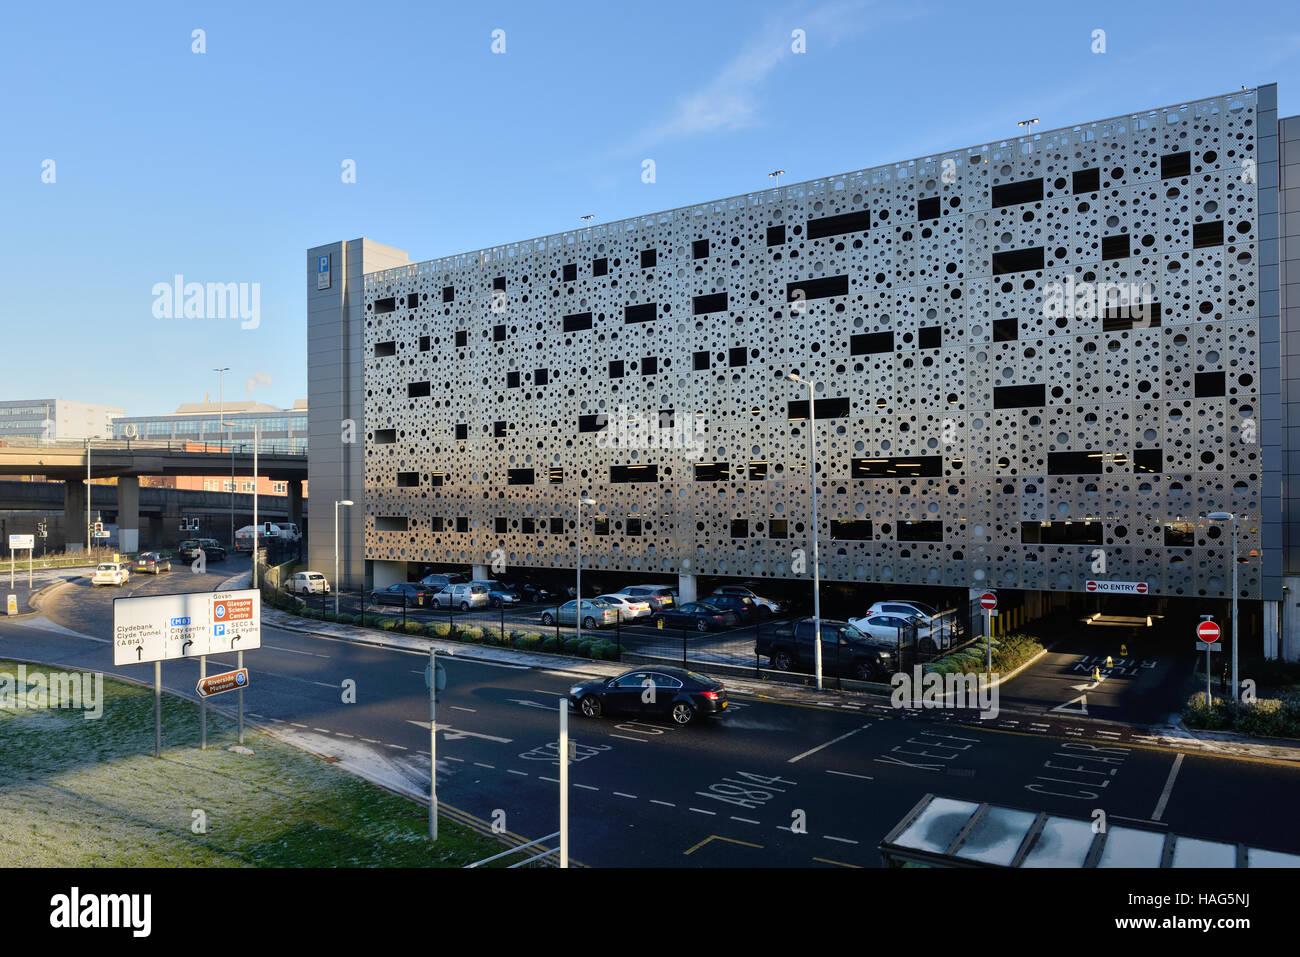 Hydro multi-storey car park in Finnieston, Glasgow, Scotland, UK - Stock Image